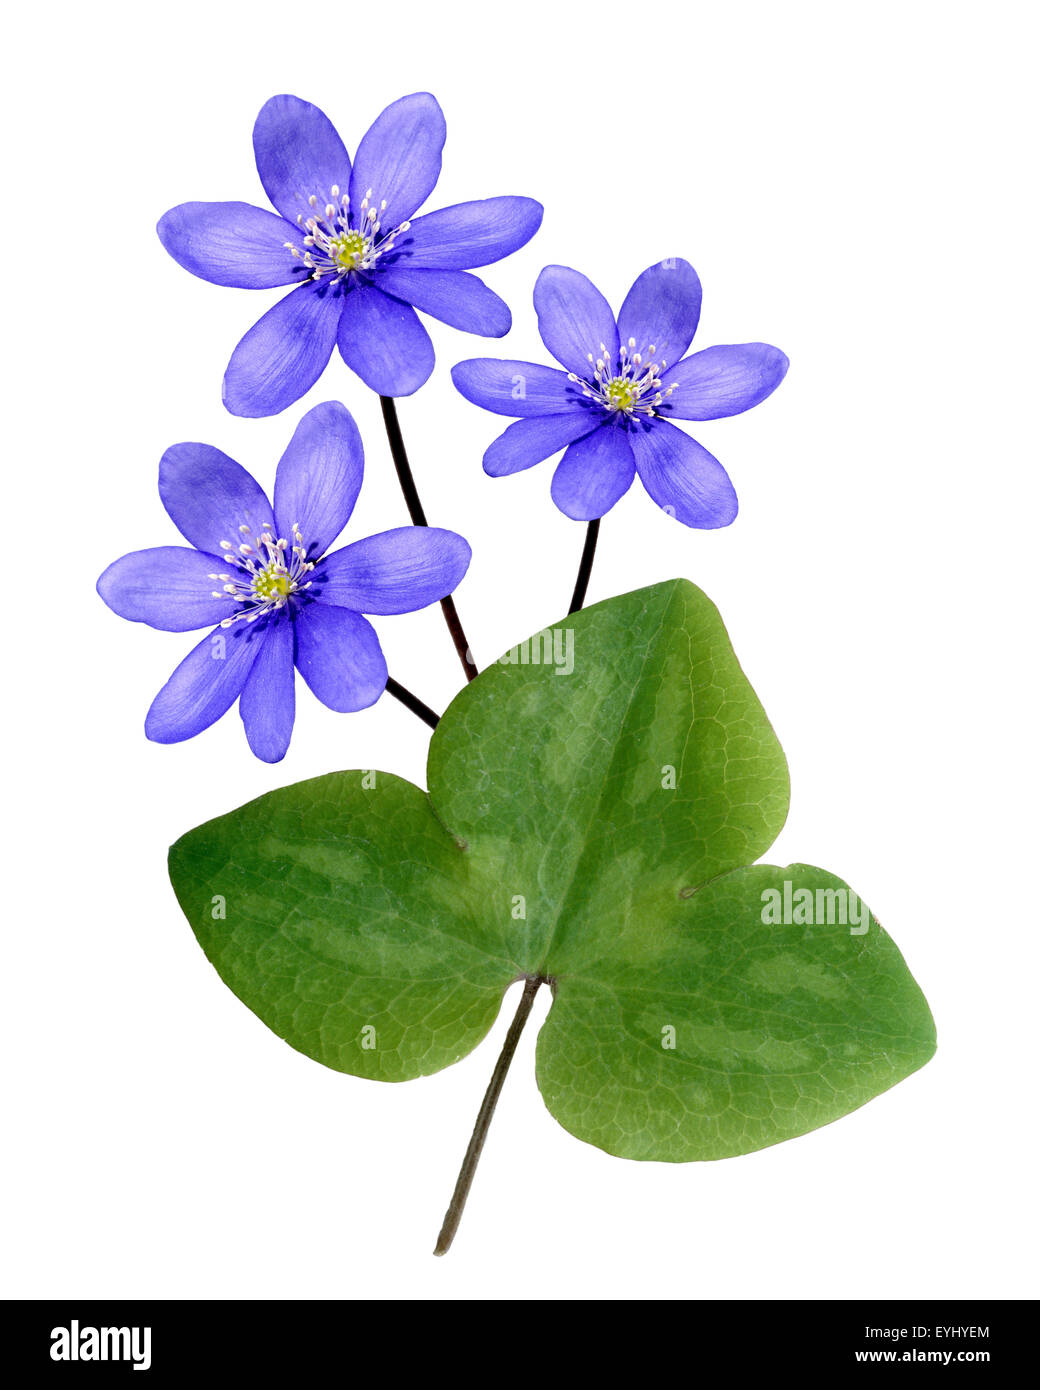 Leberbluemchen, Hepatica, nobilis, Winterblueher, Anemone hepatica, blaue blueten, blau, Blume des Jahres 2013, Stock Photo